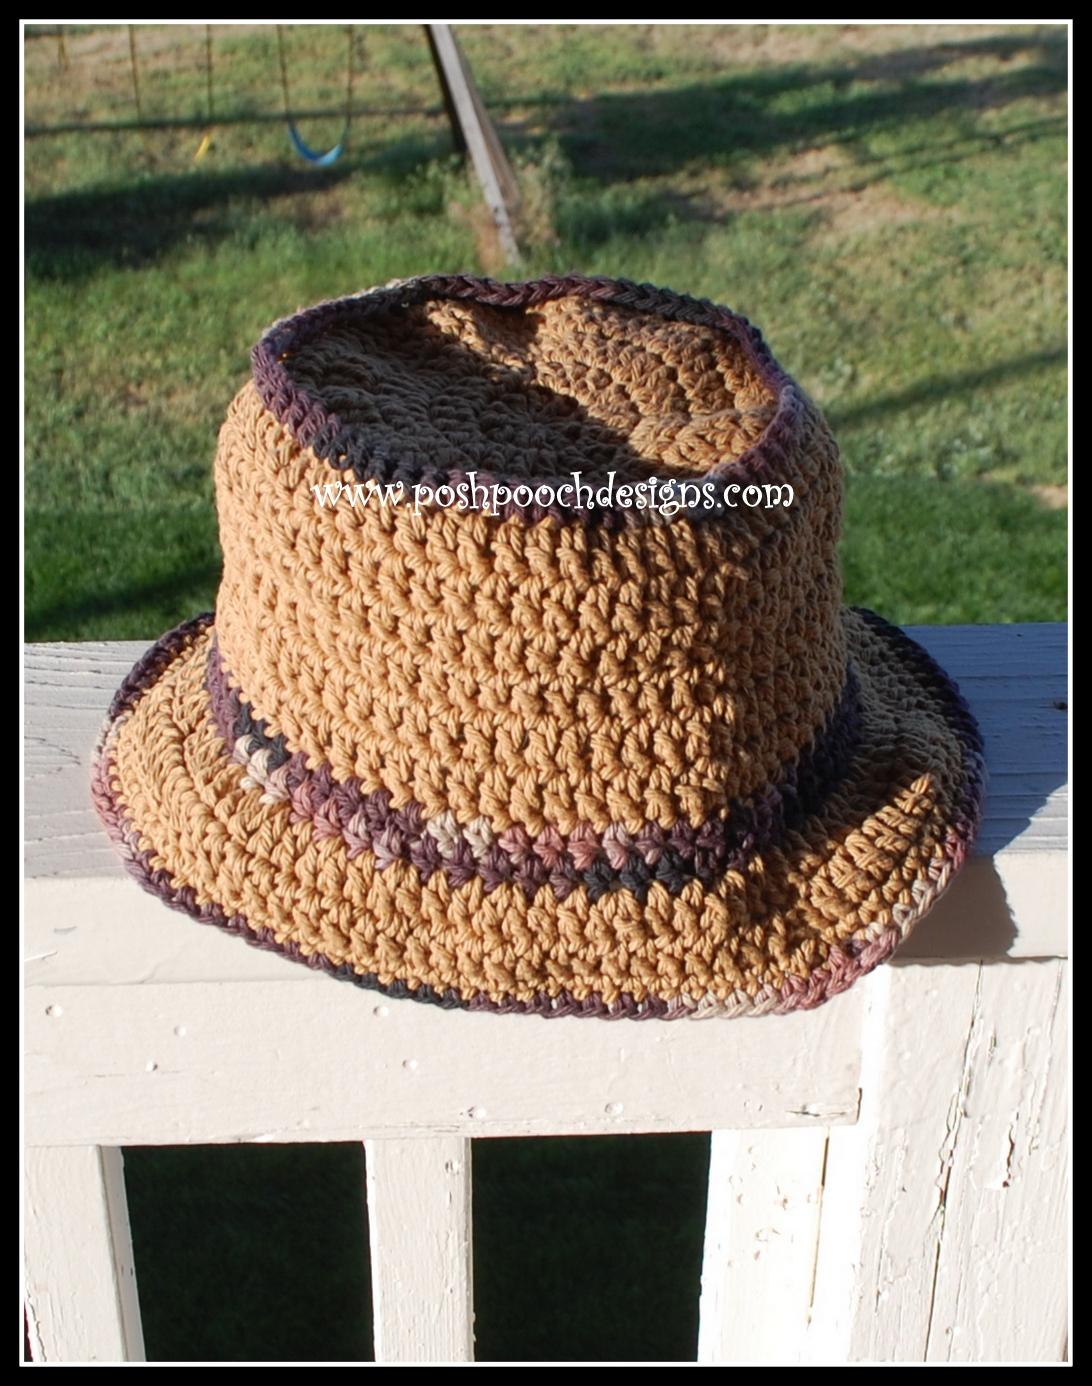 Posh Pooch Designs Dog Clothes: Opa\'s Hat - Men\'s Summer Bucket Hat